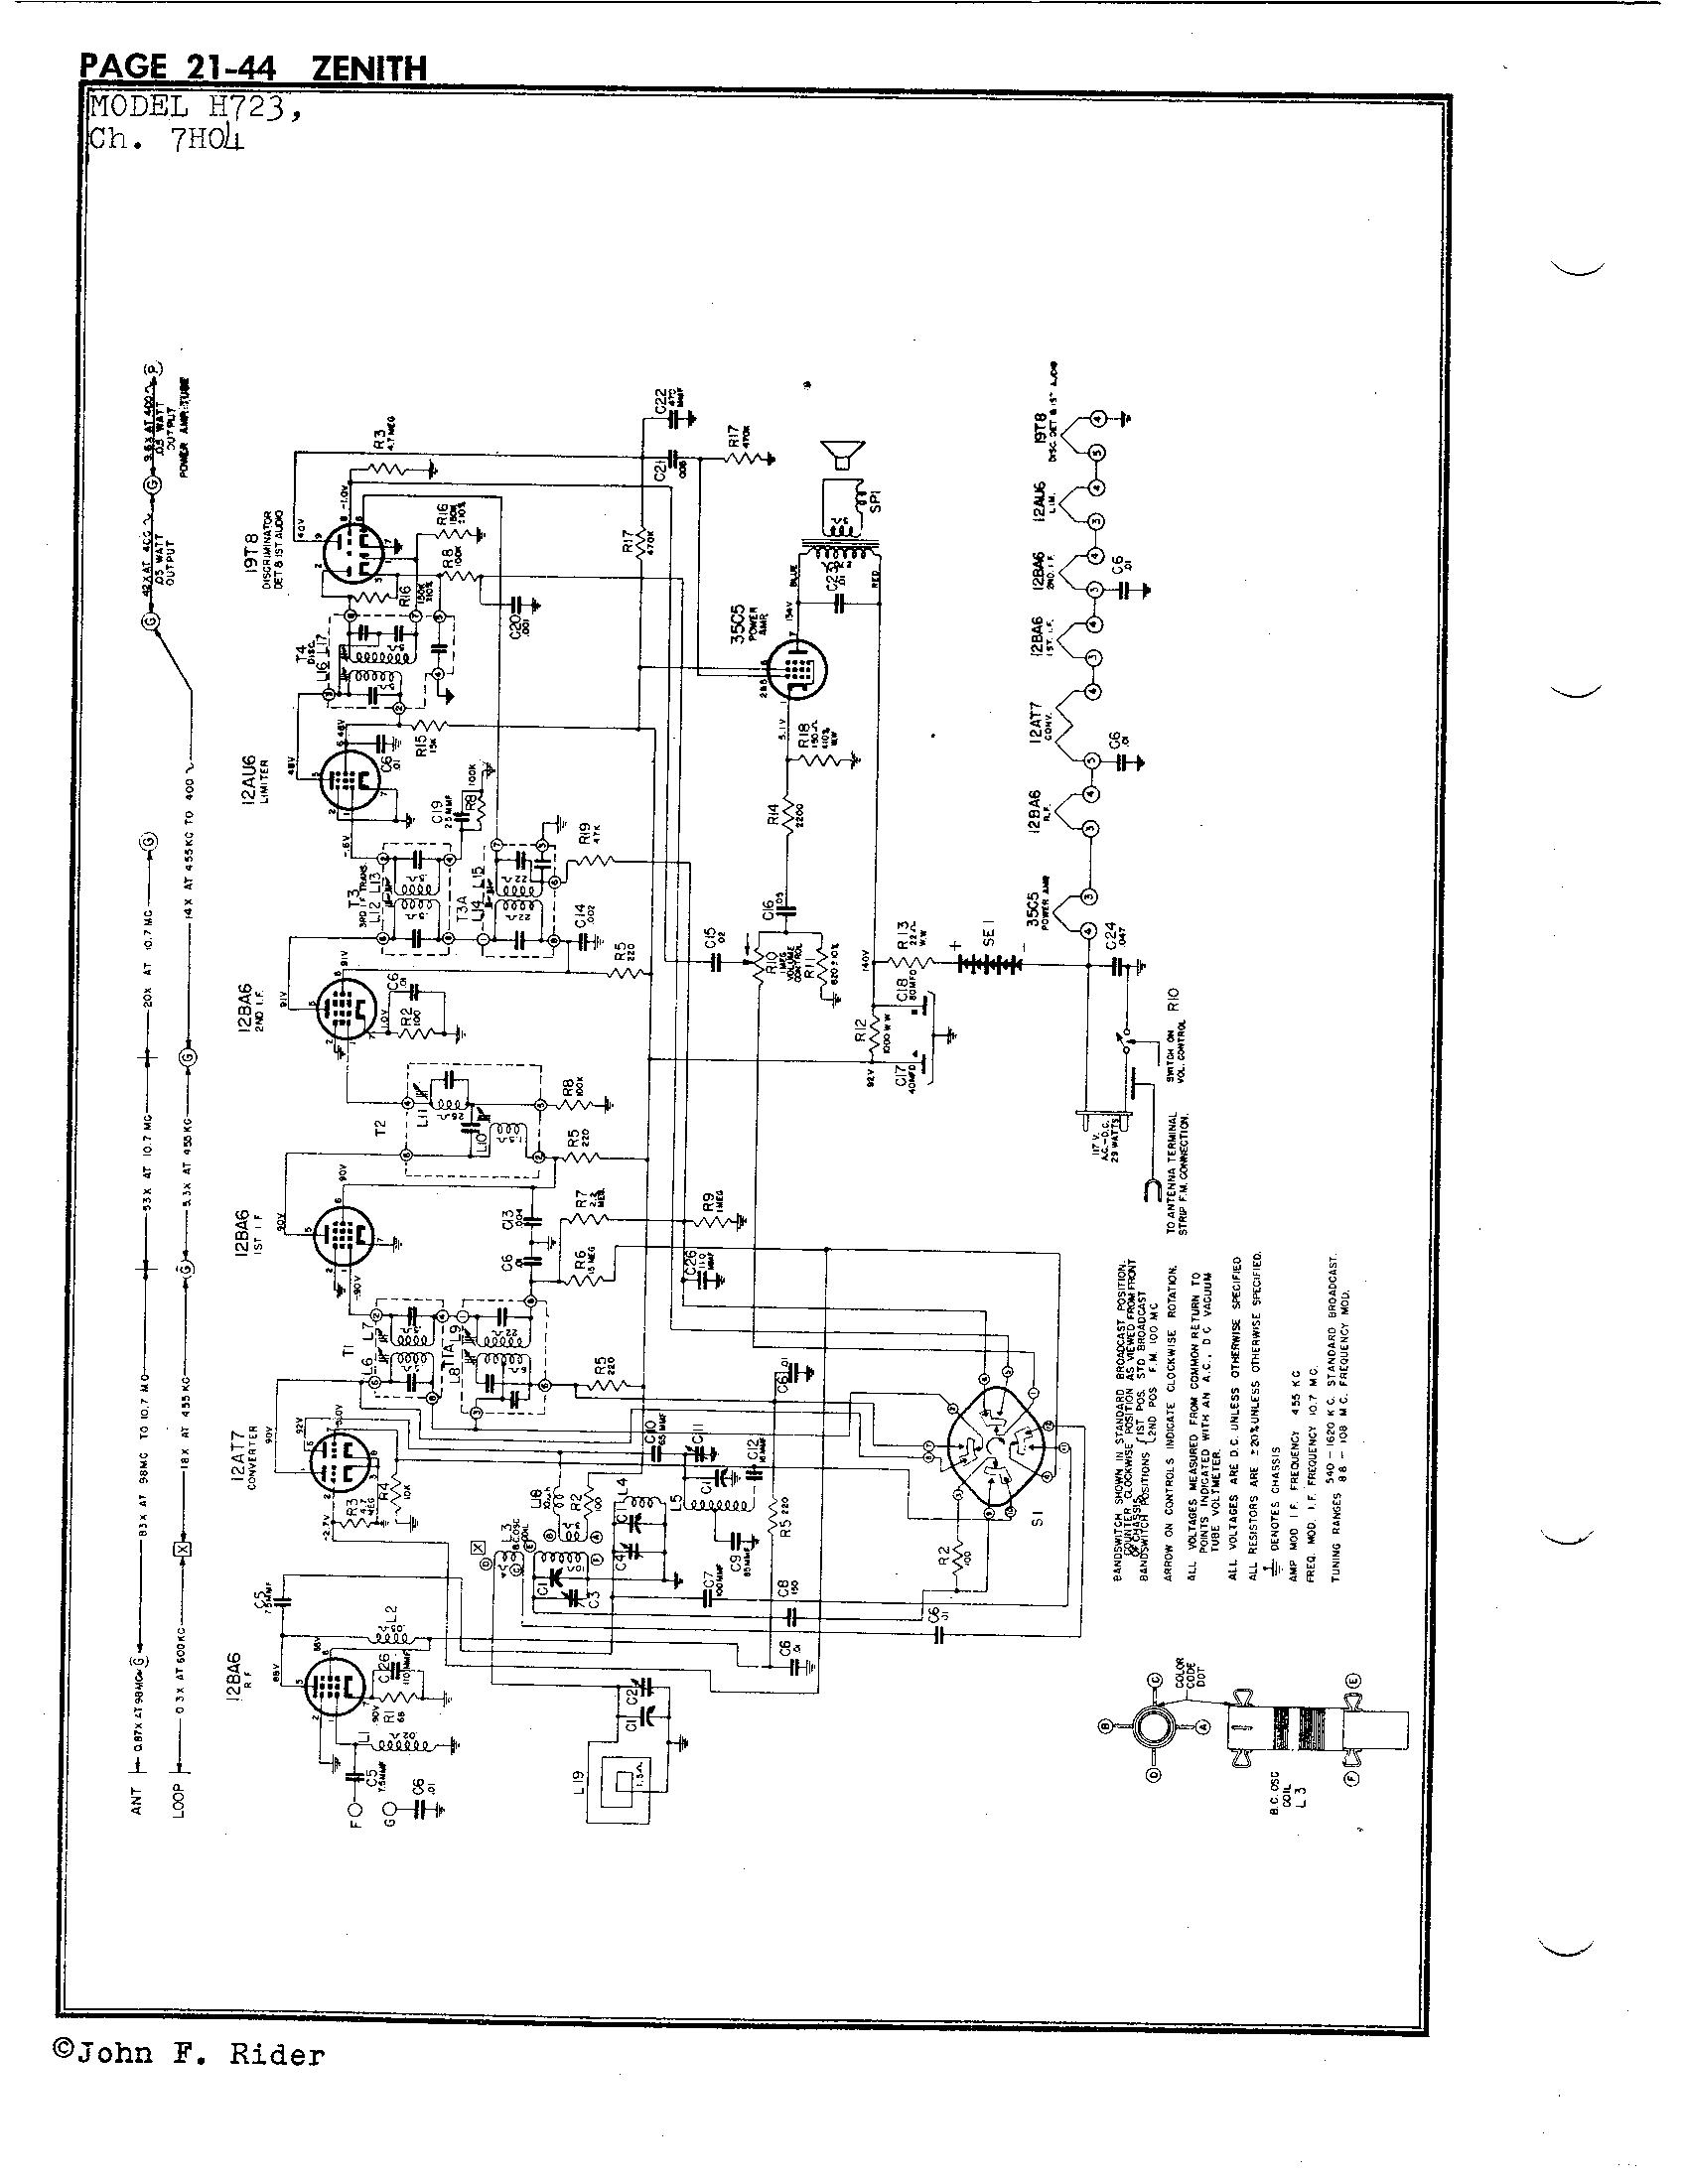 Zenith Radio Corp H723